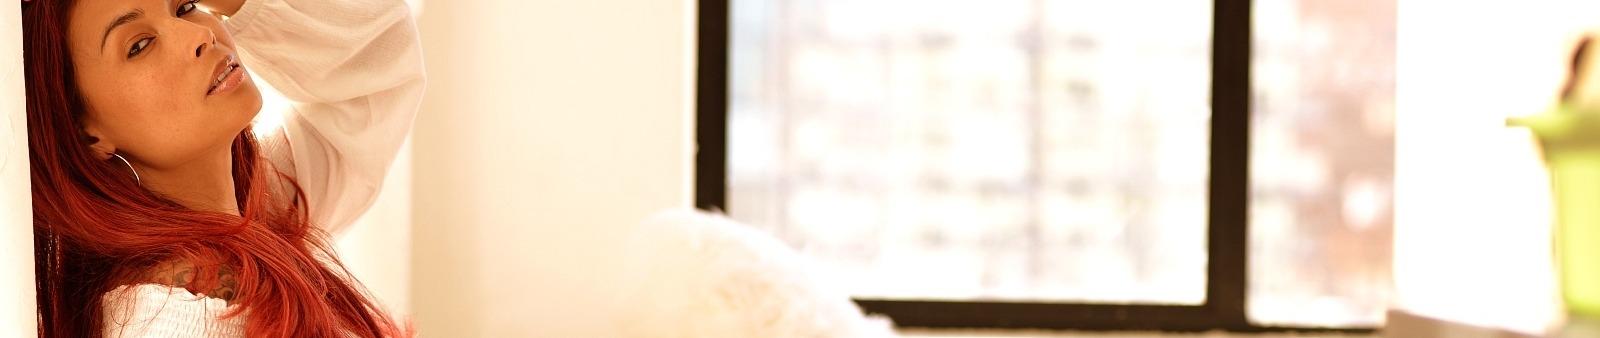 Tera Patrick - profile image